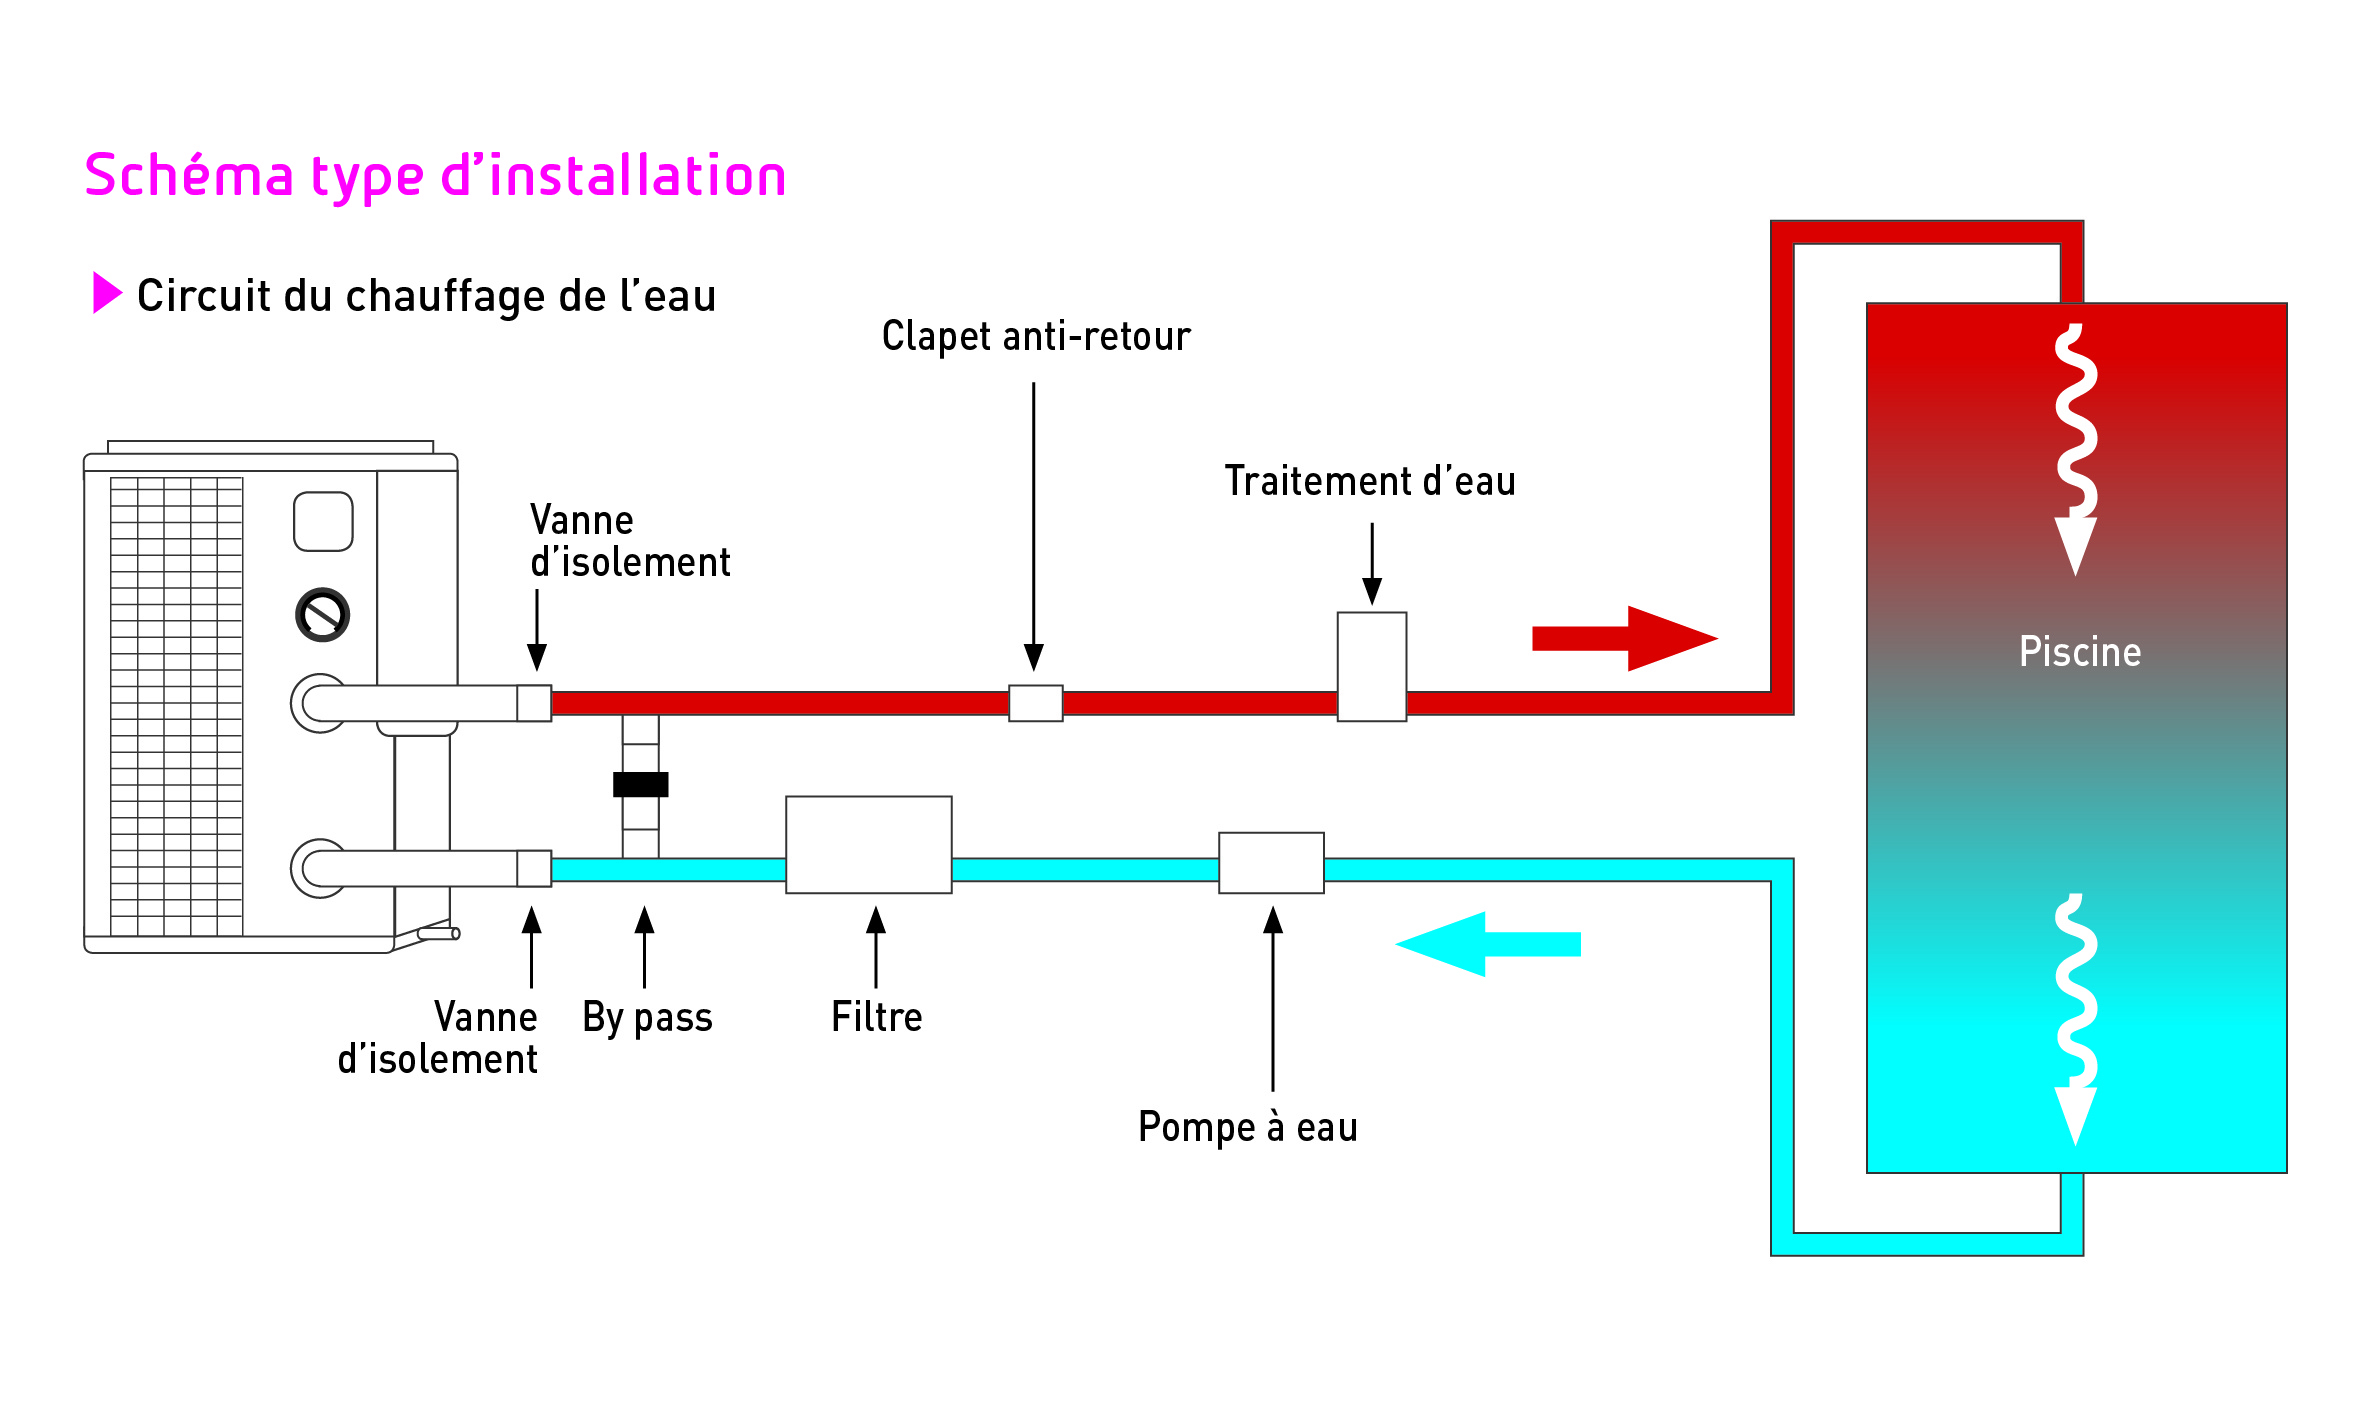 Schéma type d'installation – PAC grosse puissance